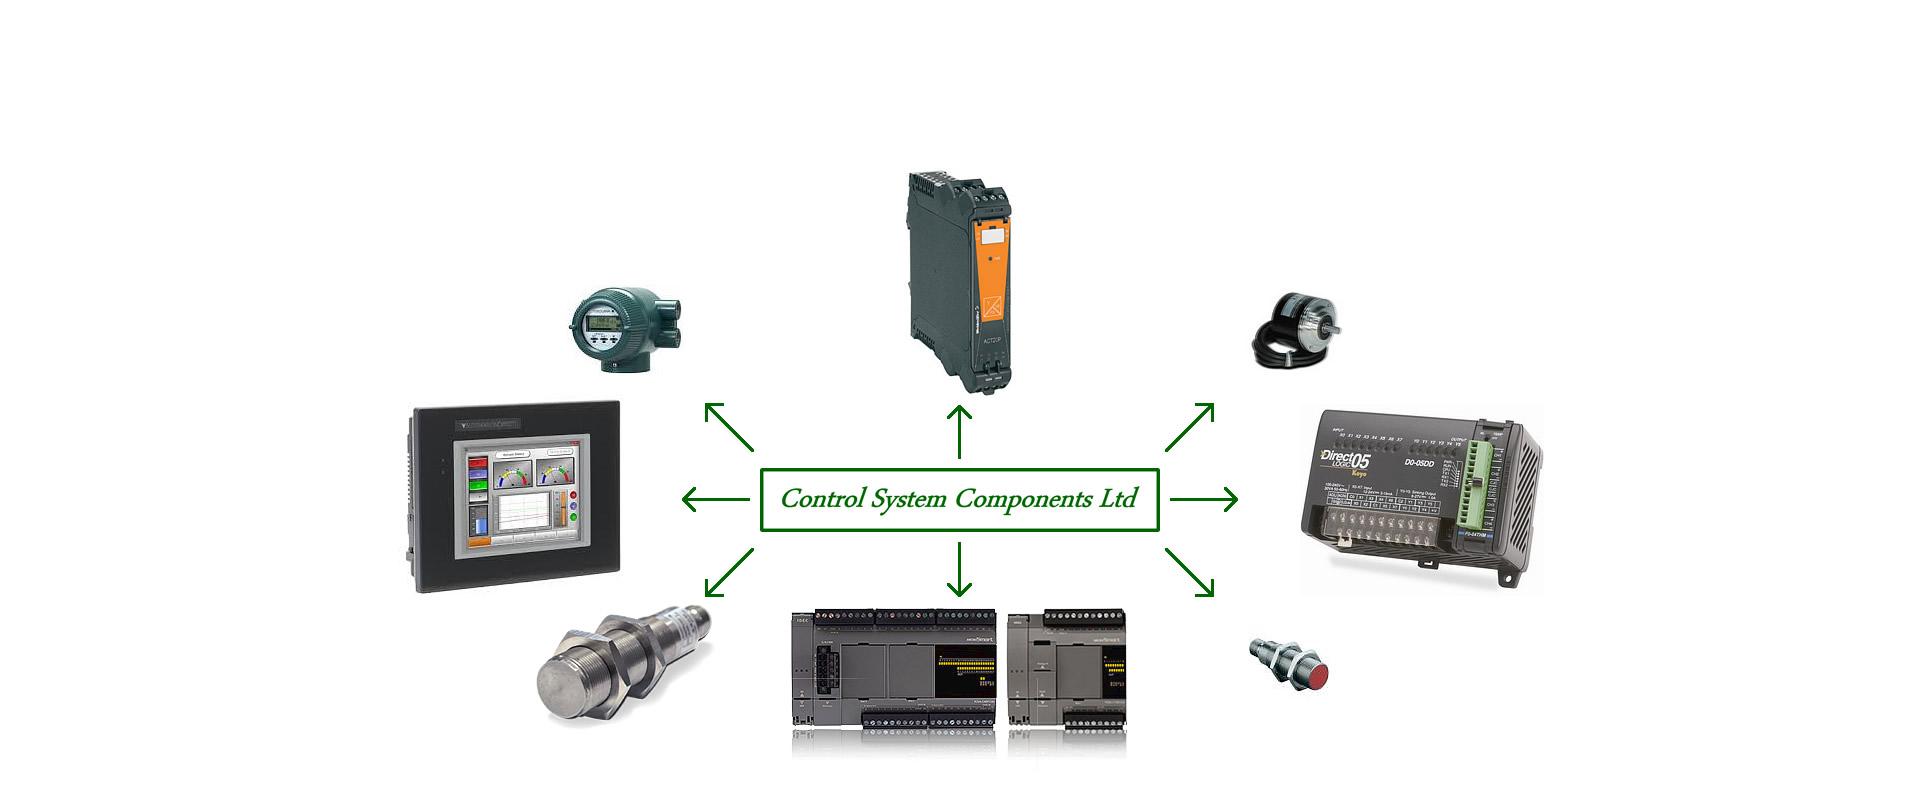 Control System Components Ltd